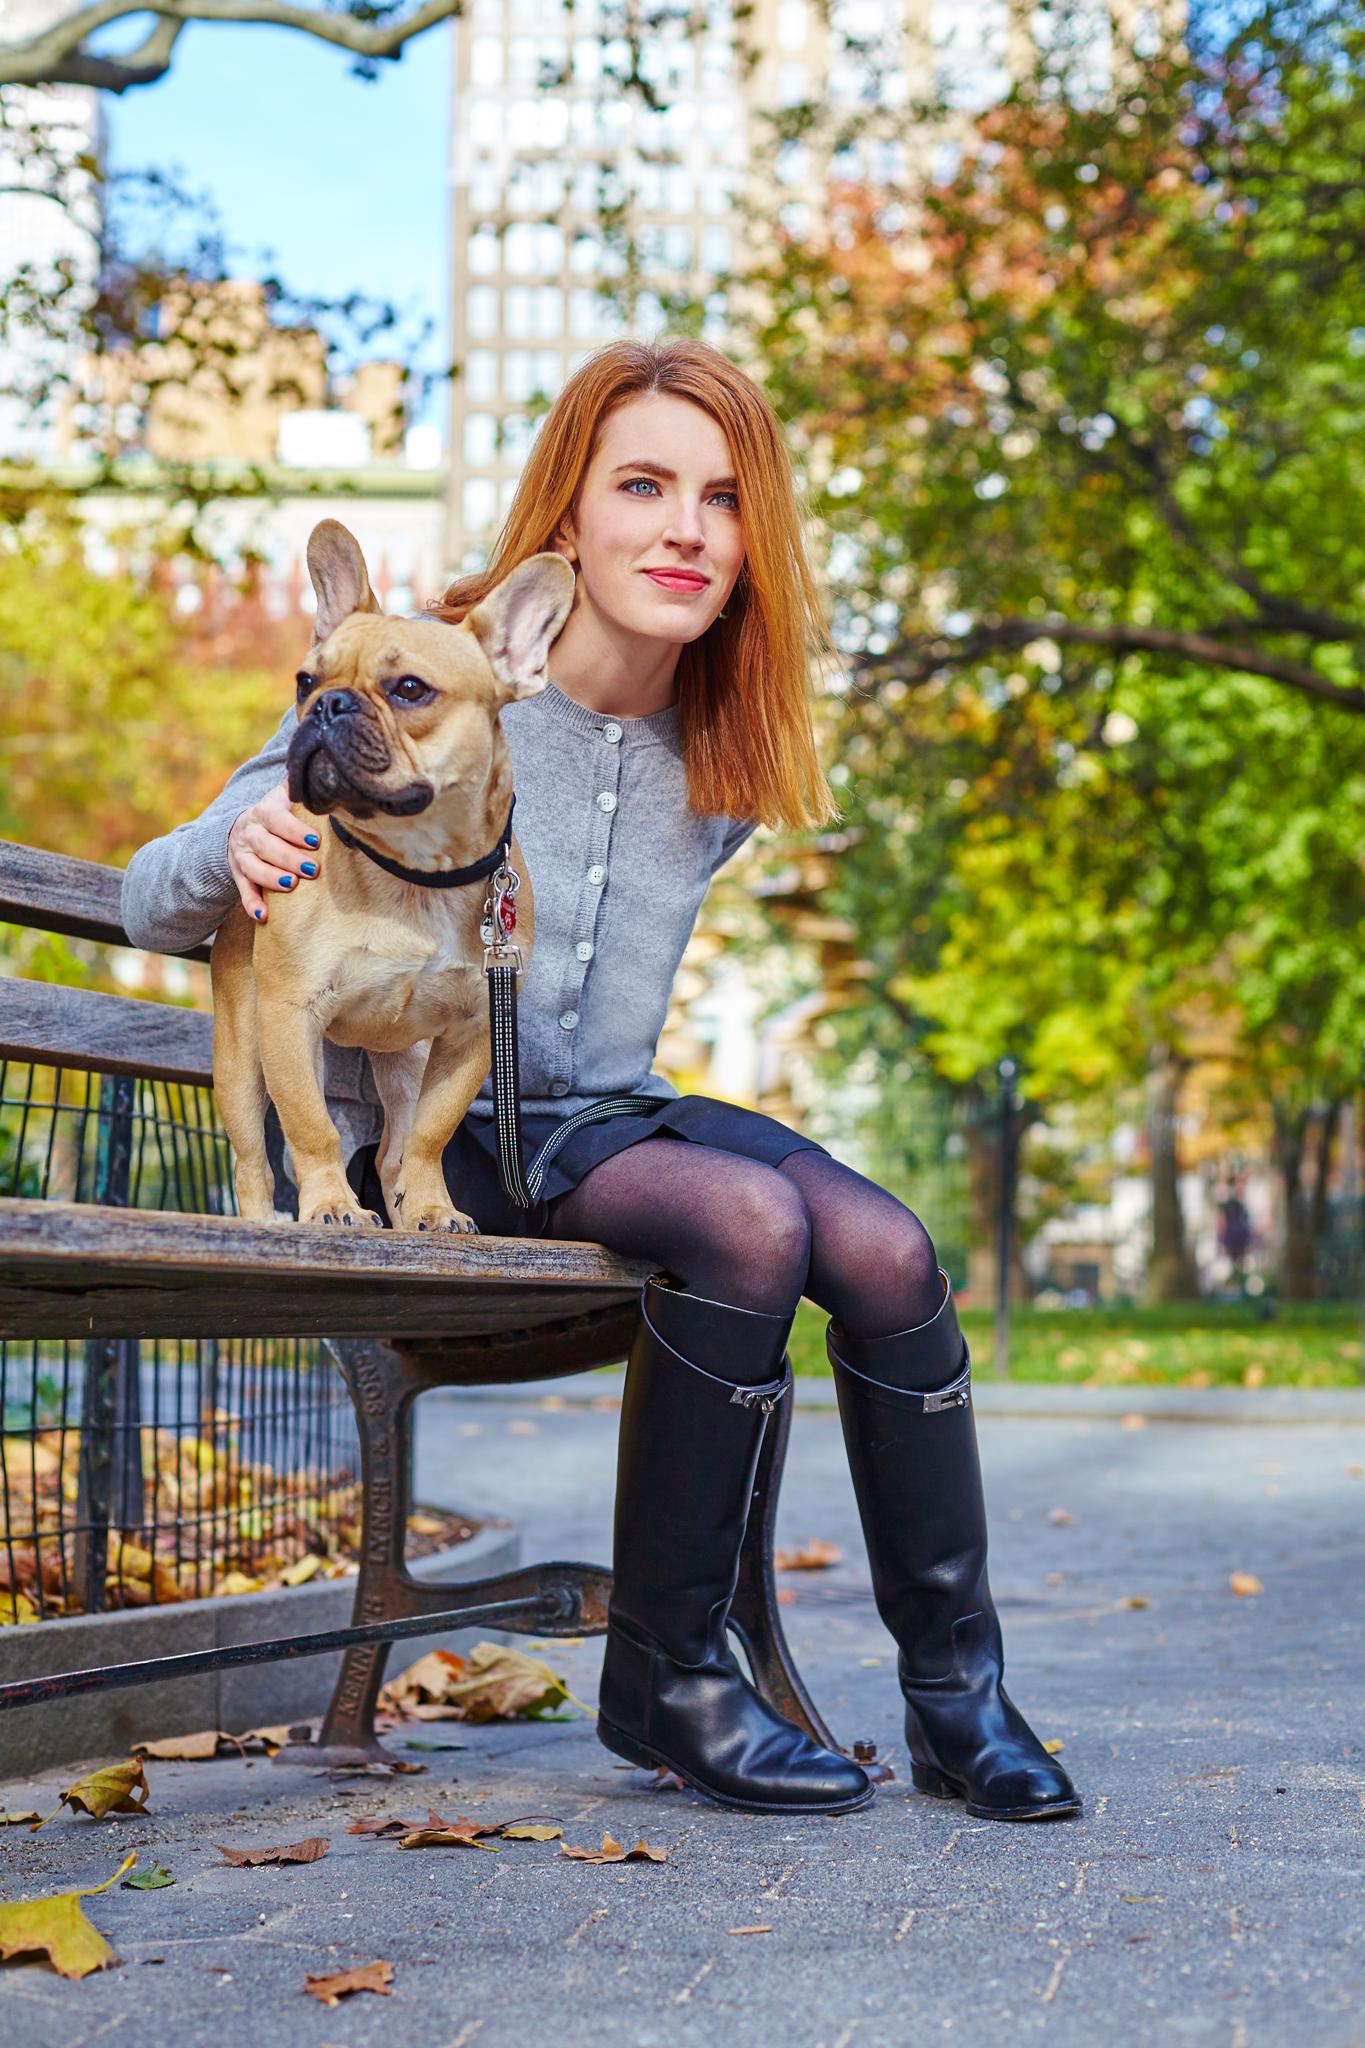 boprey-pet-photography-portrait-nyc_7.jpg